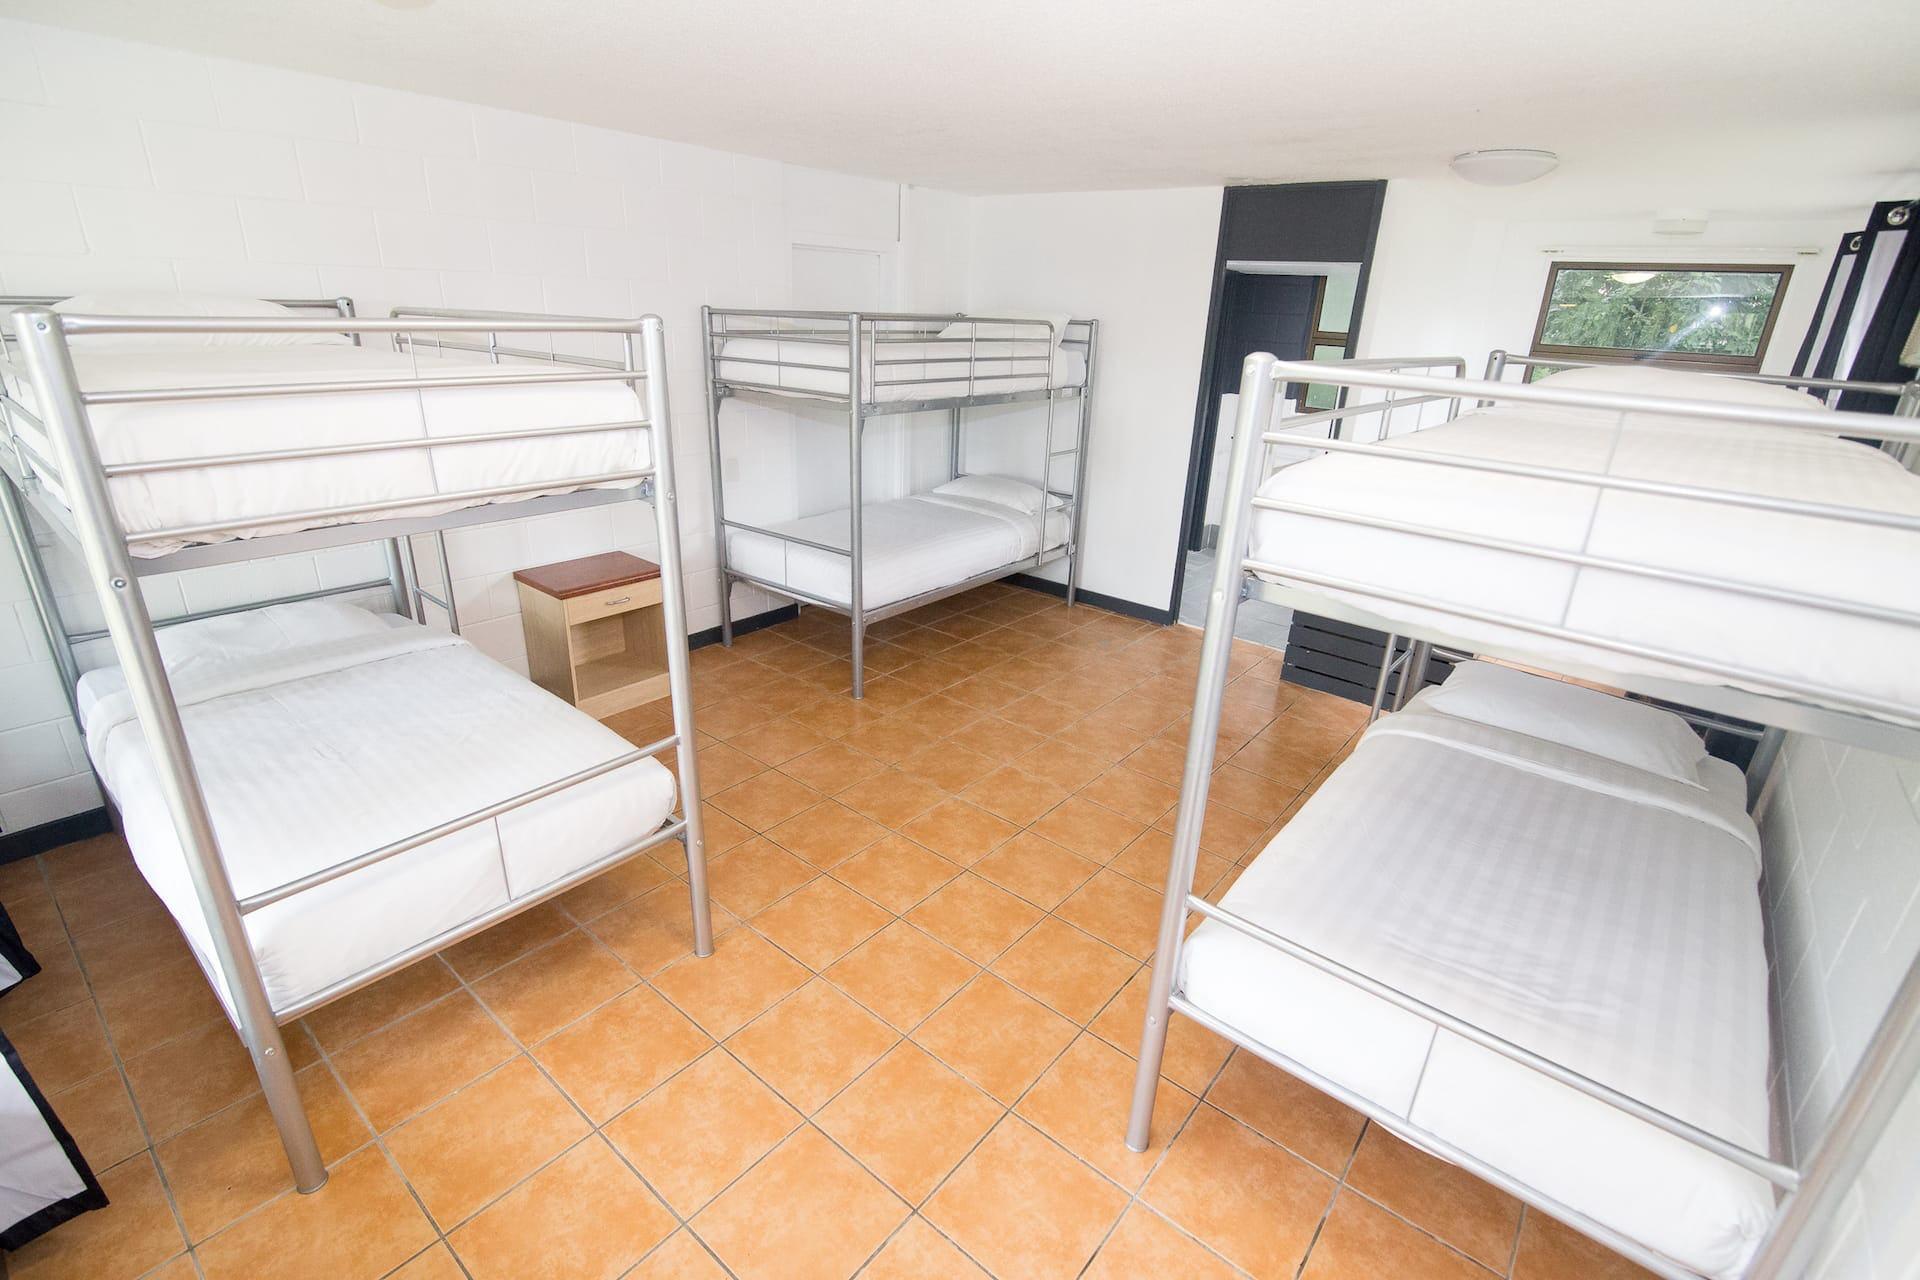 Base艾尔利滩背包客旅馆的6床套房